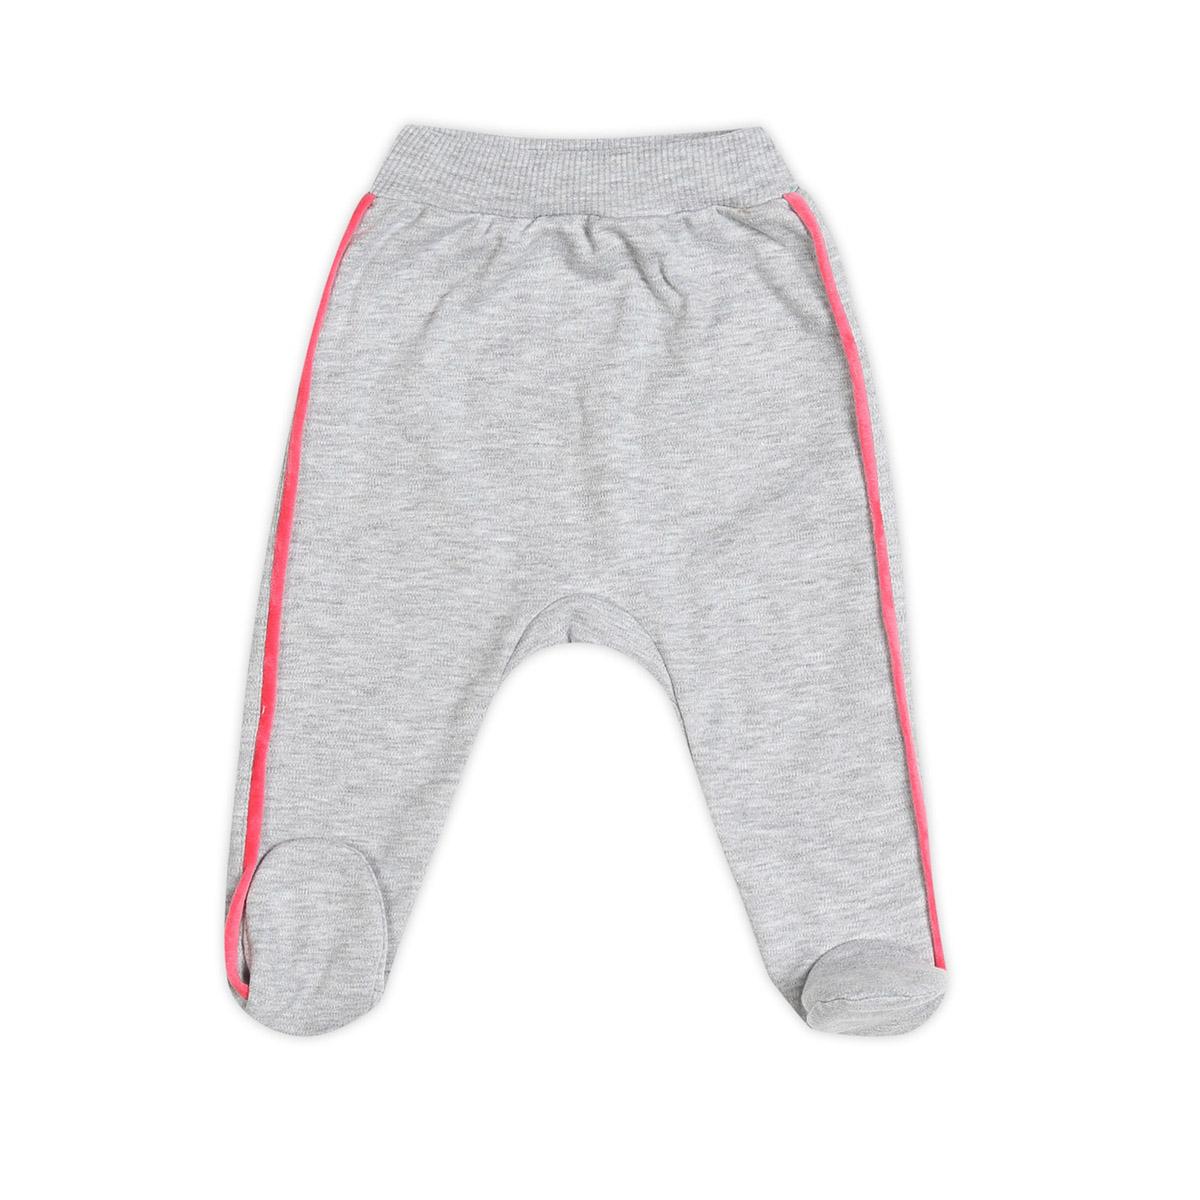 Ползунки с ножками Ёмаё Спорт (26-265) рост 62 серый меланж<br>